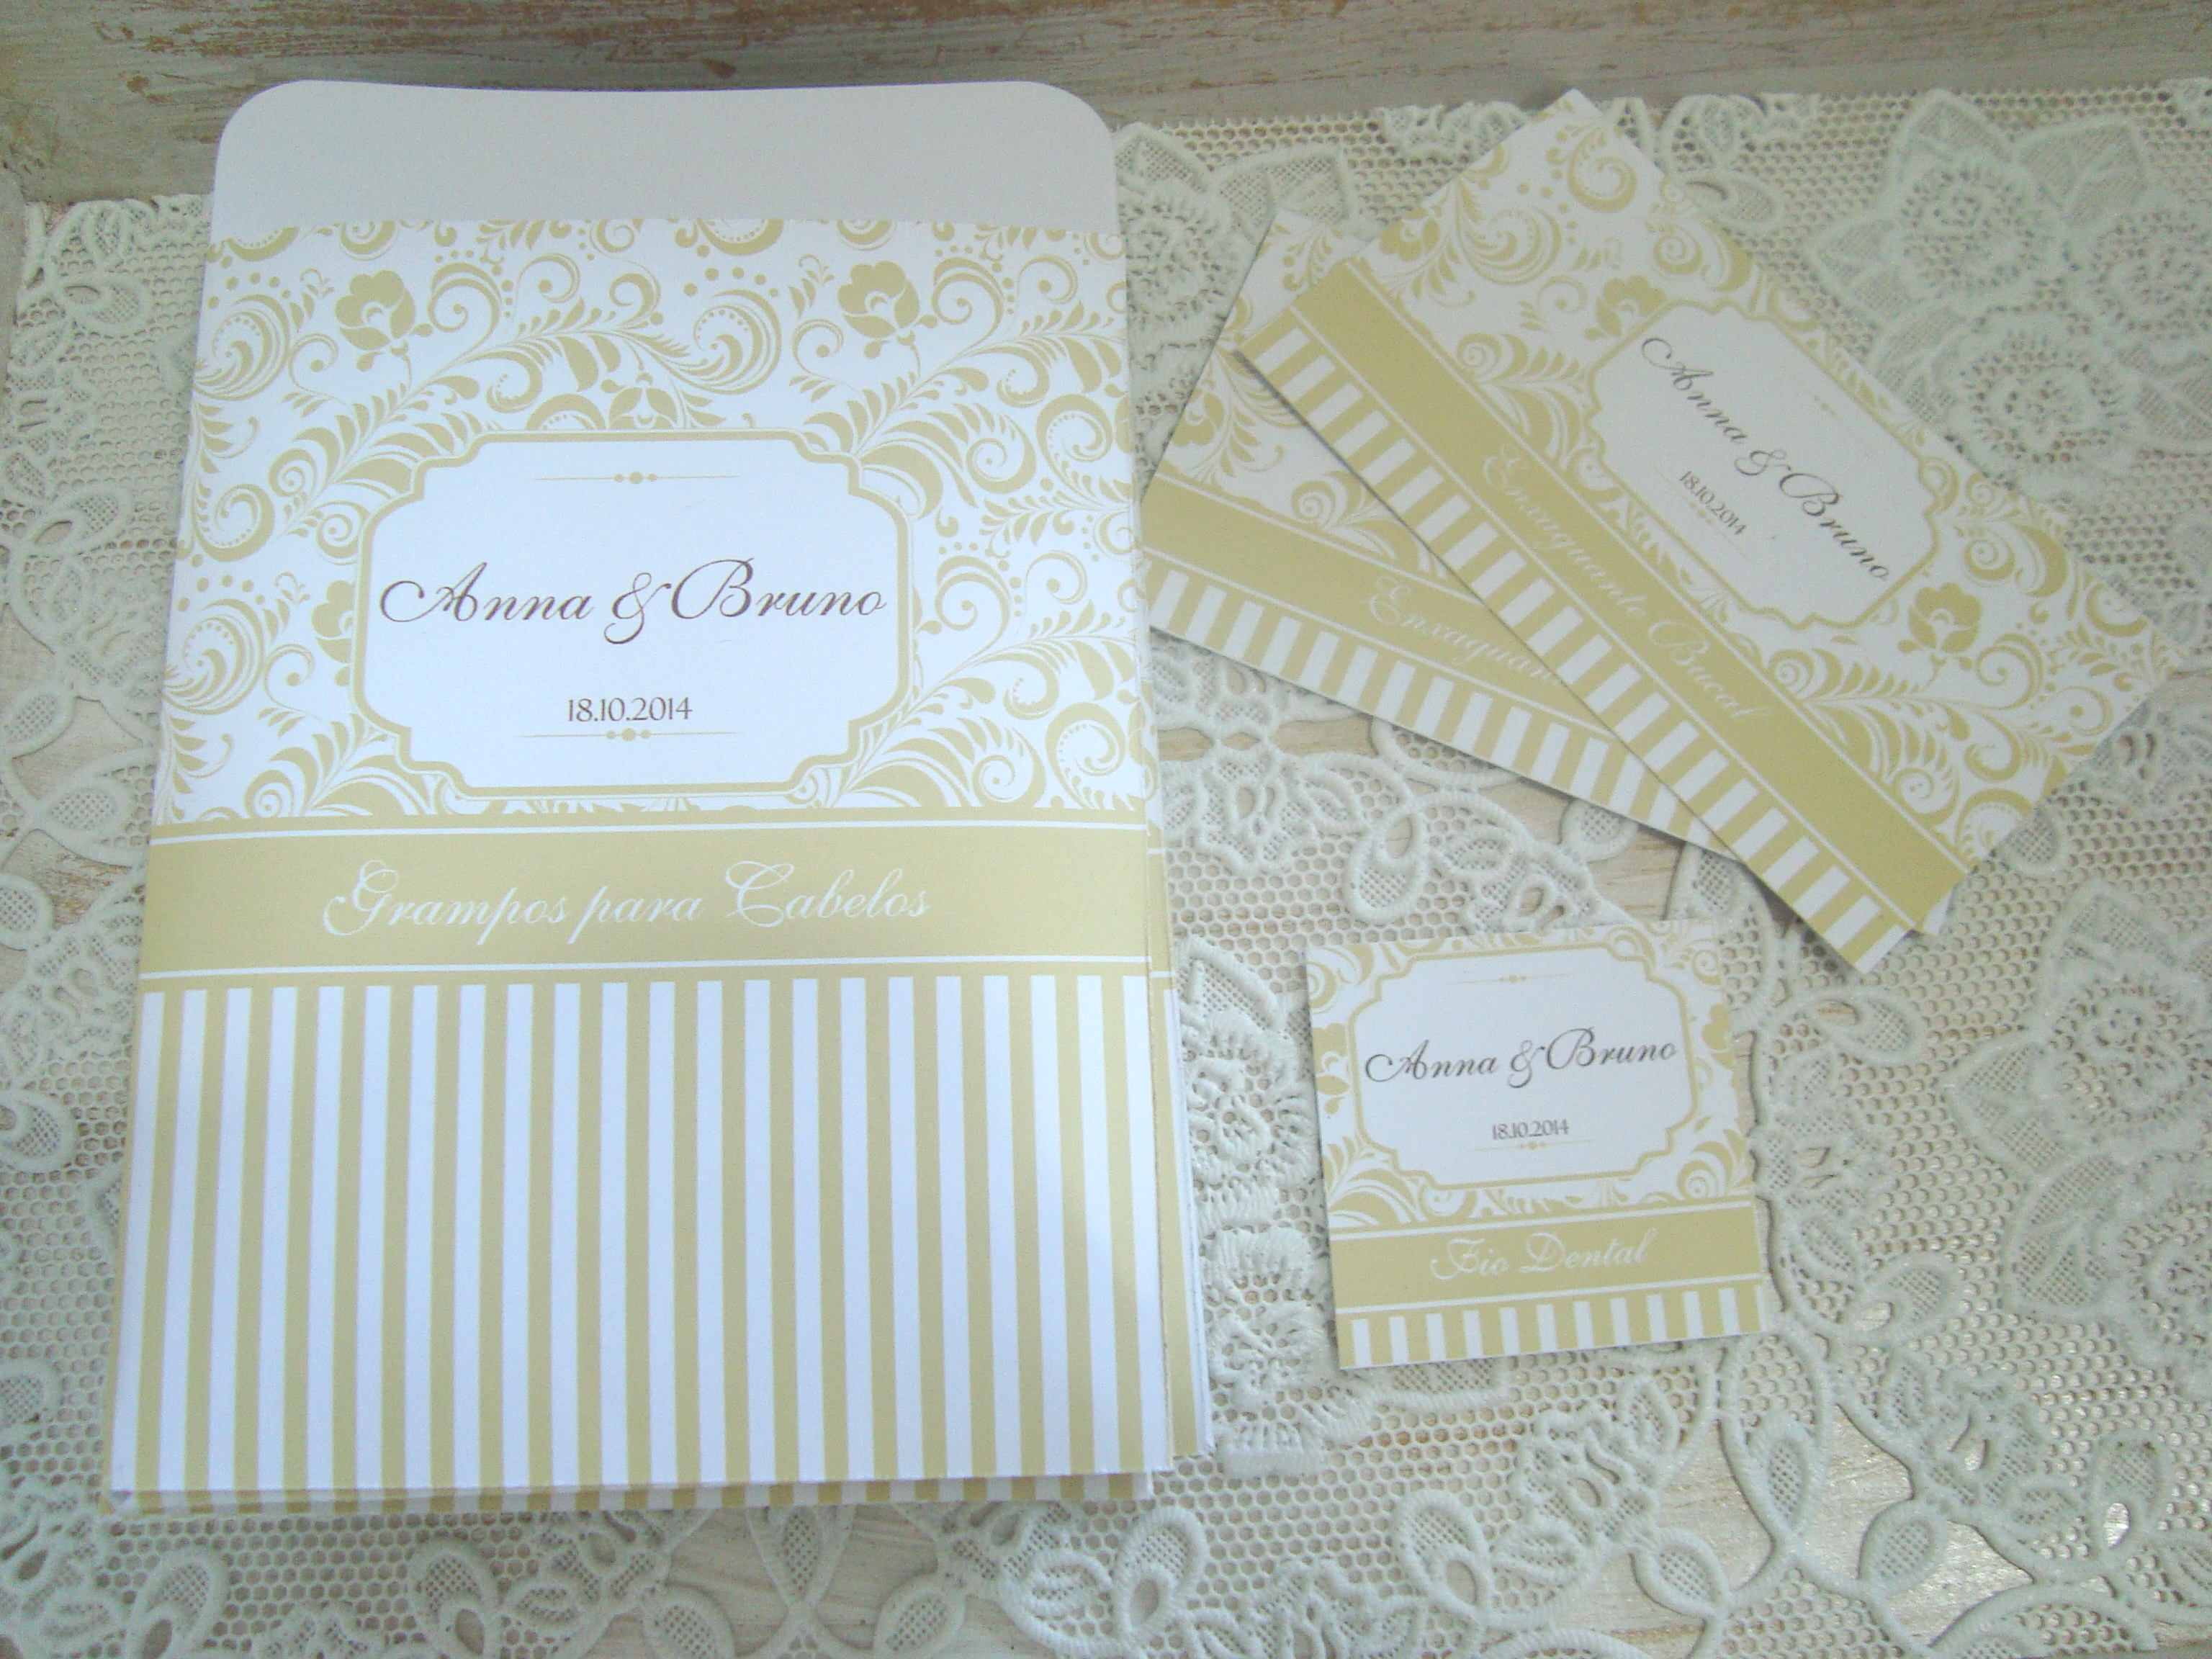 Rótulos para kit banheiro casamento : R?tulos kit toalete dourado papelaria personalizada tudo